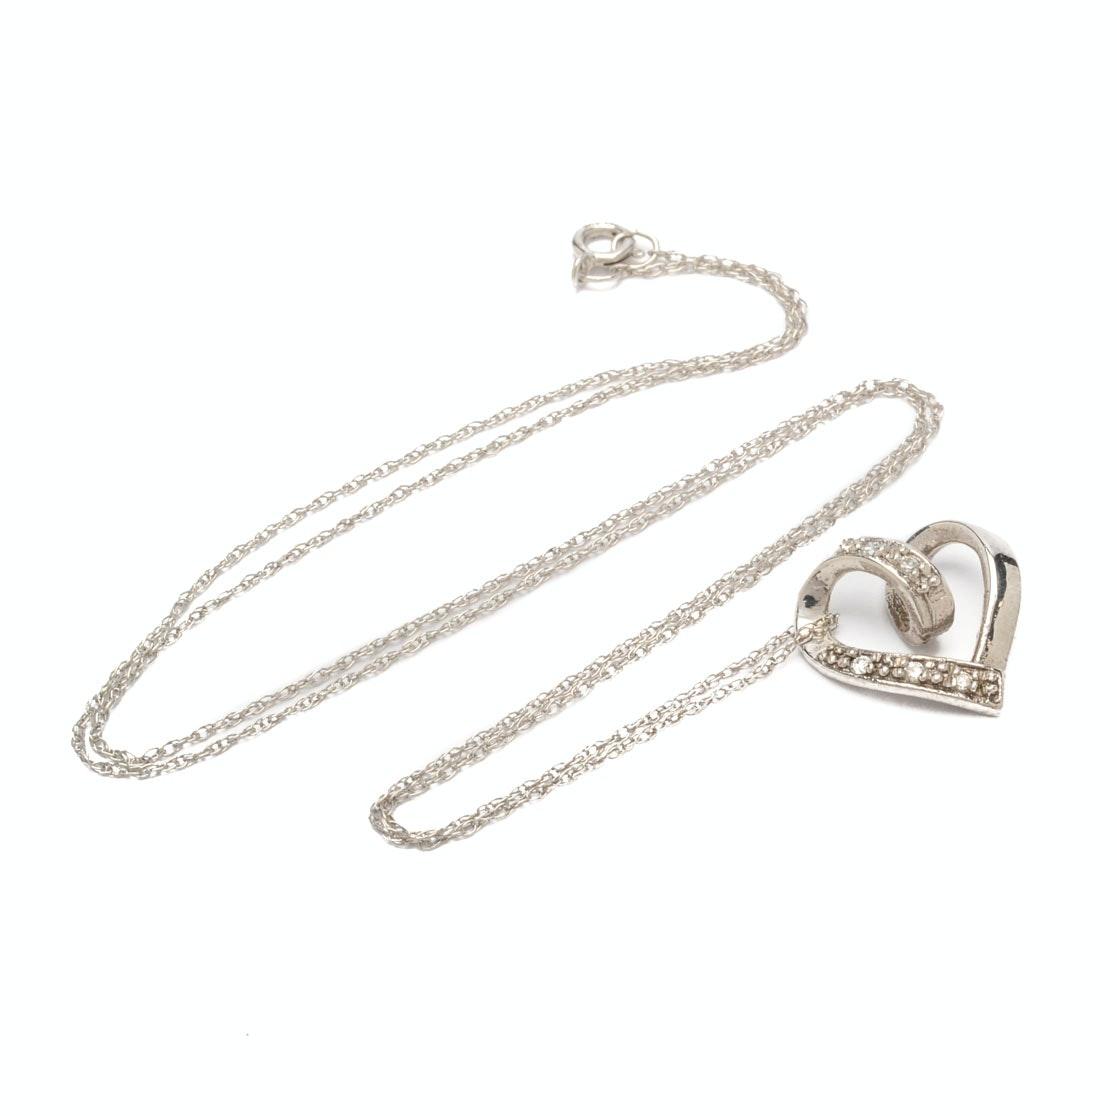 10K White Gold Diamond Heart Pendant on 14K Gold Chain Necklace